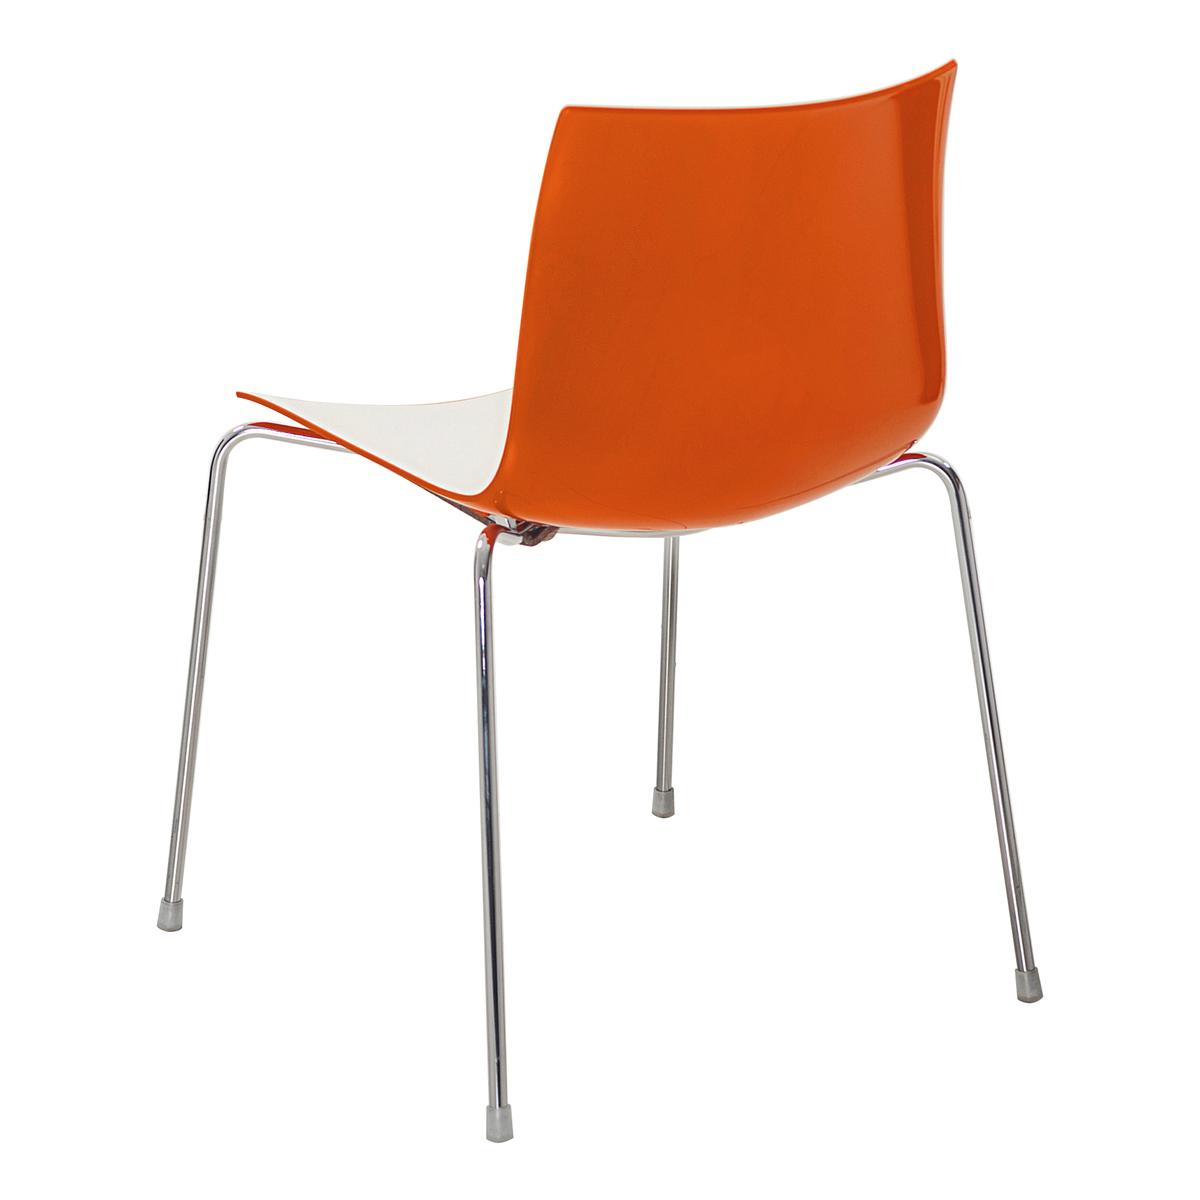 Stuhl Catifa 46, 4-Fuß, weiß-orange